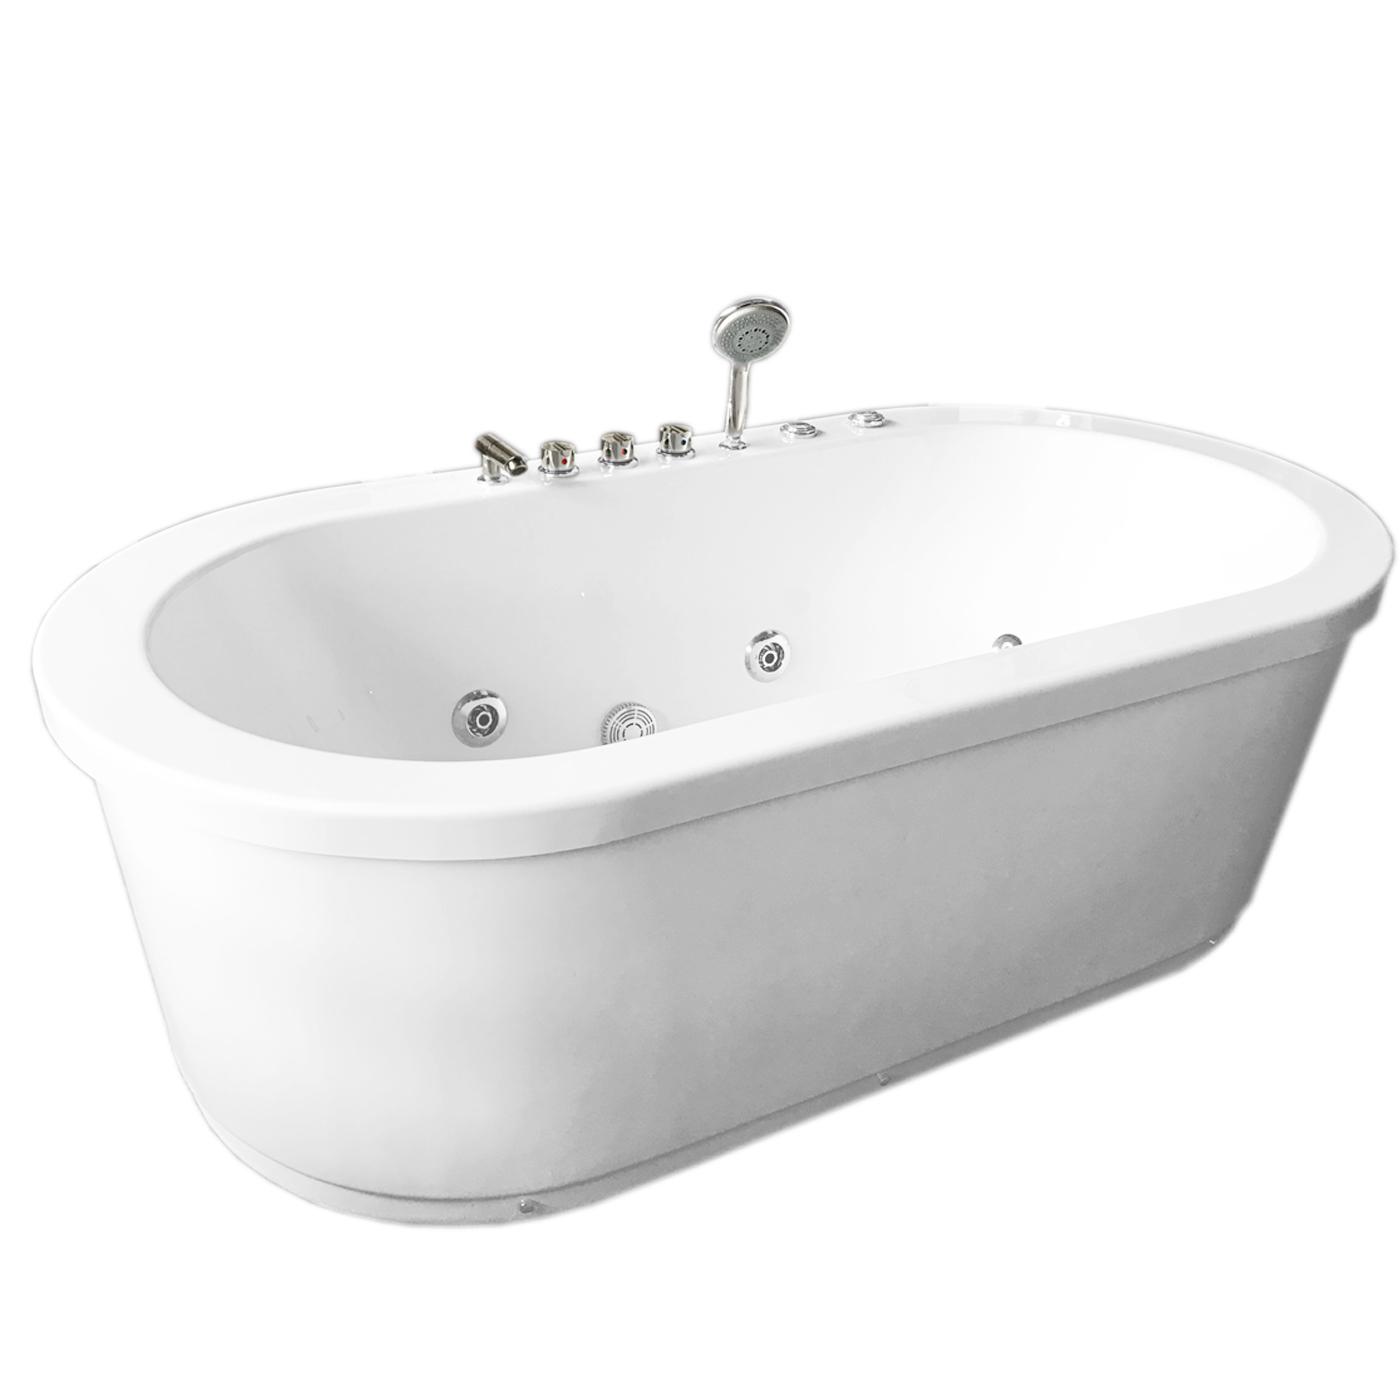 Whirlpool Freestanding Modern Bathtub Double Pump 16 Nozzle Hot Tub ...